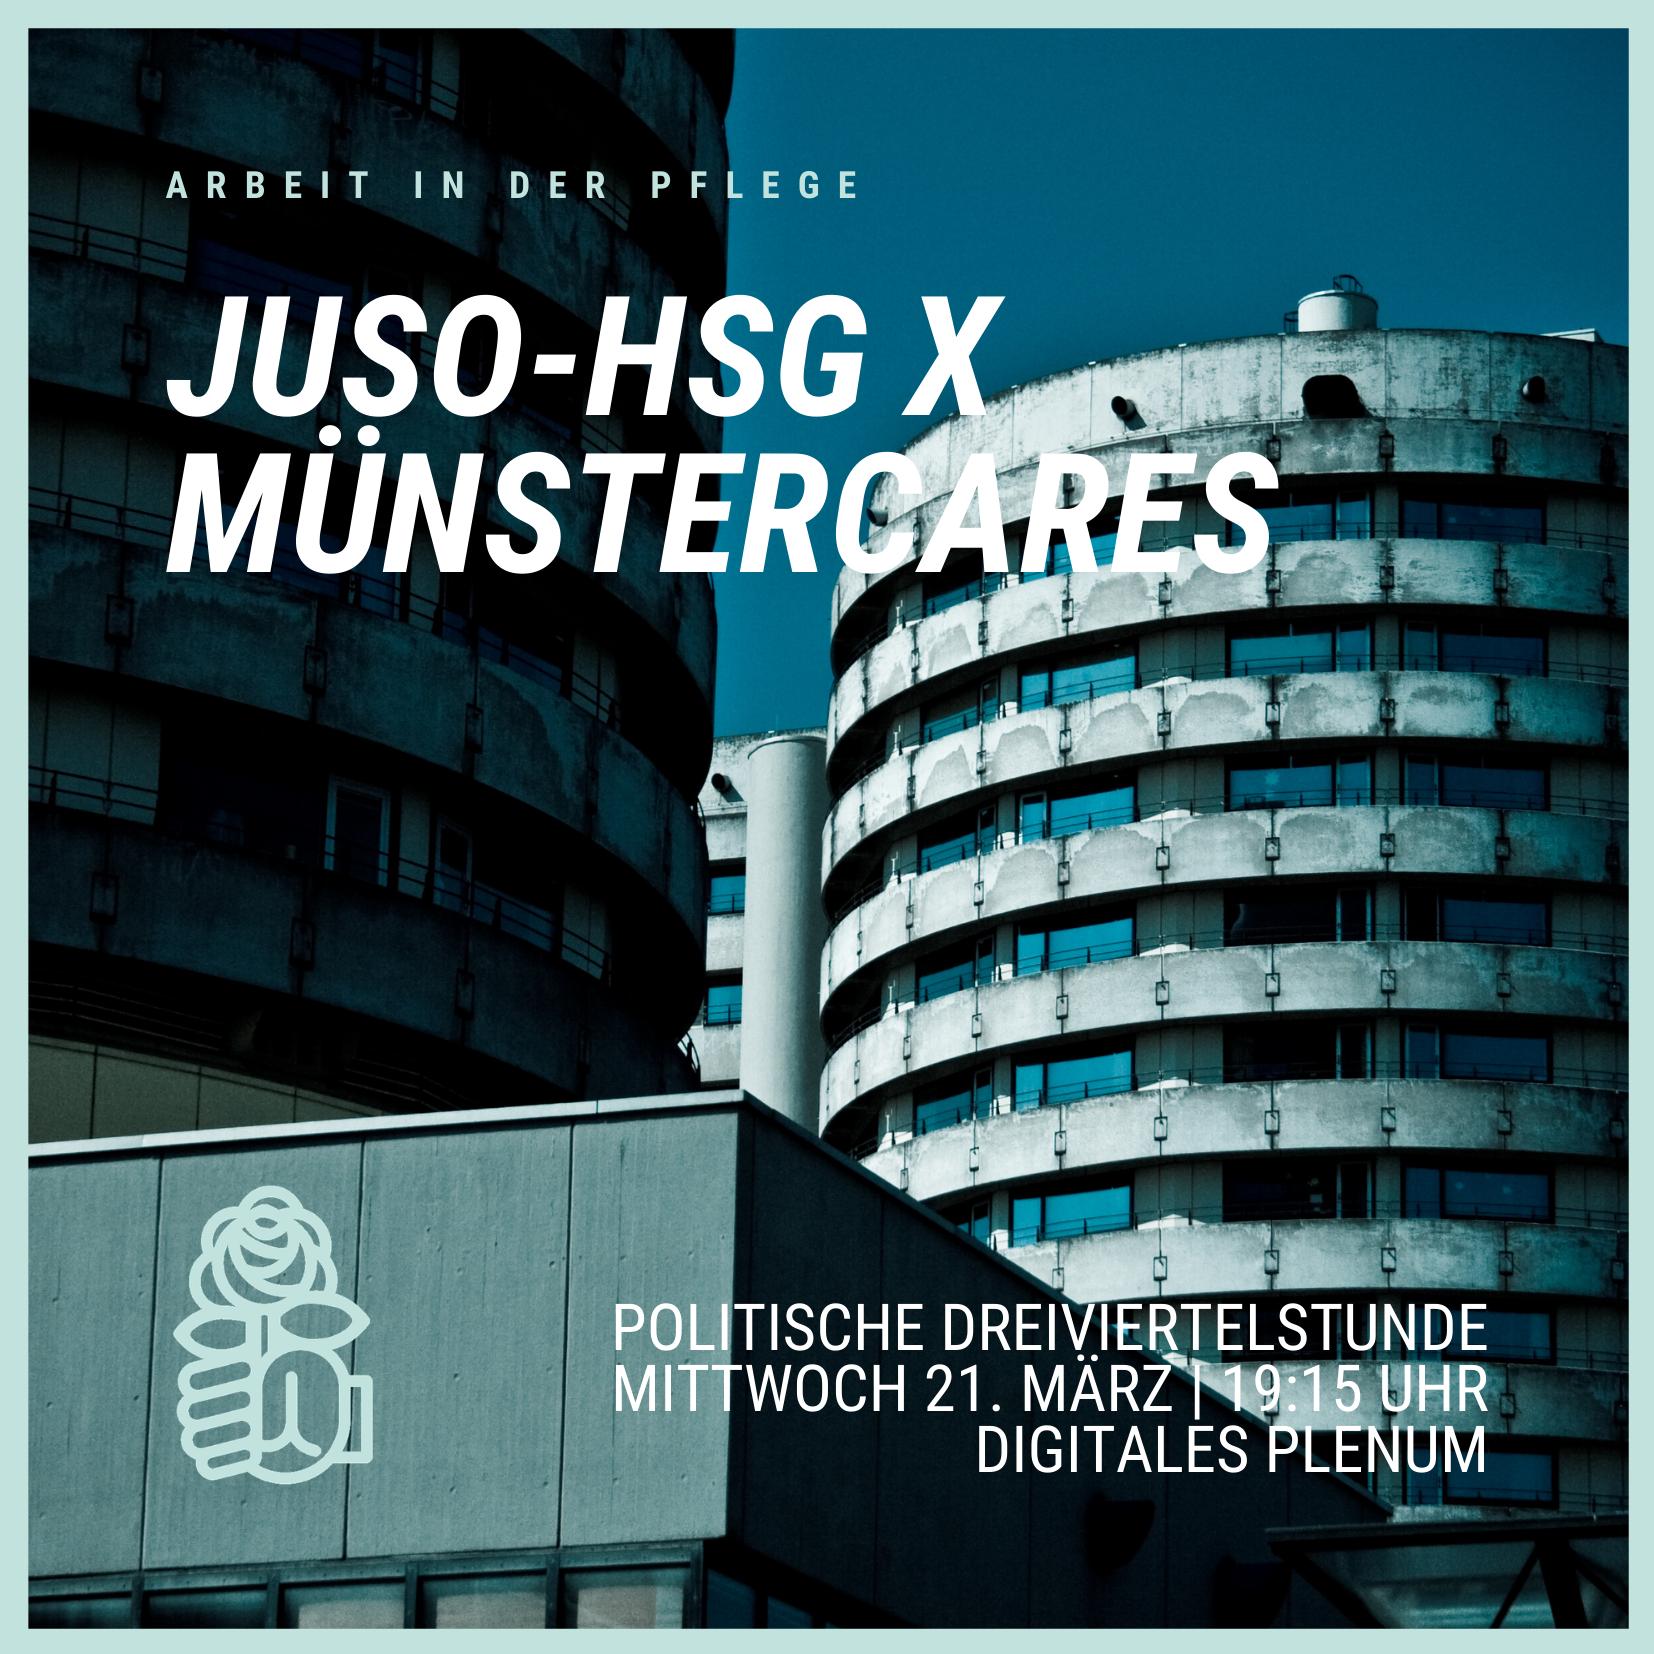 Münstercares Sharepic(2)